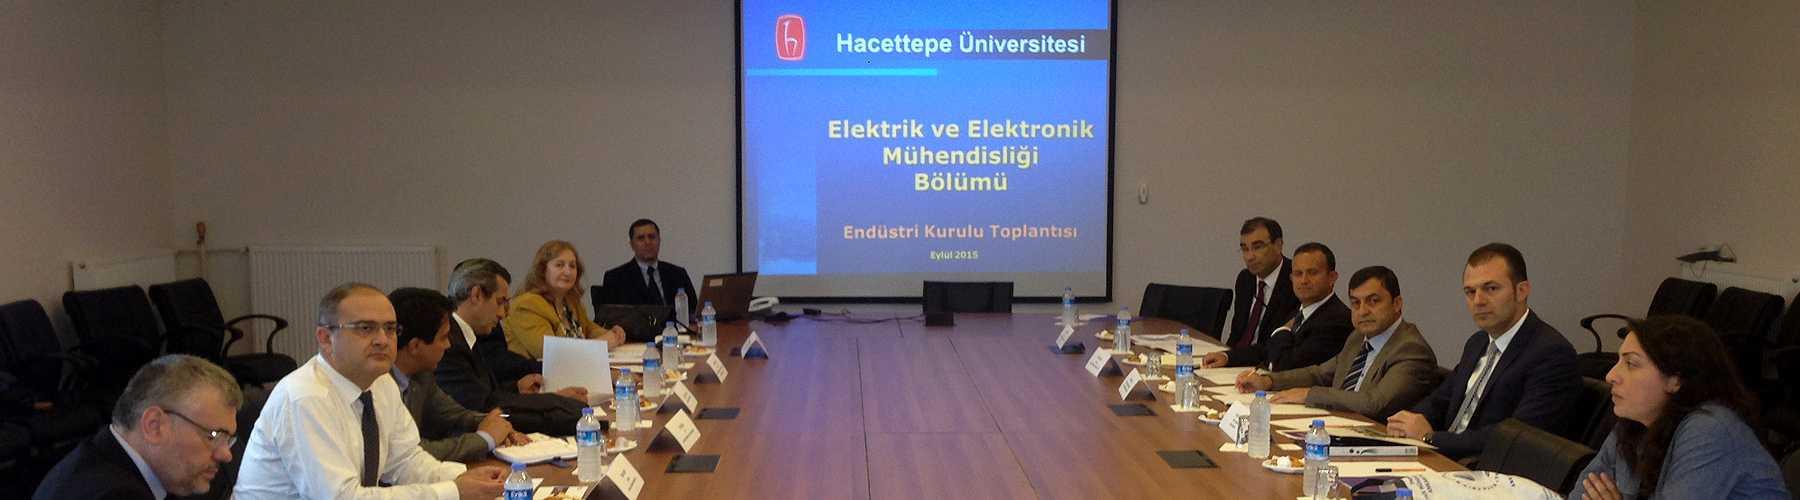 Hacettepe Universitesi Elektrik Ve Elektronik Muhendisligi